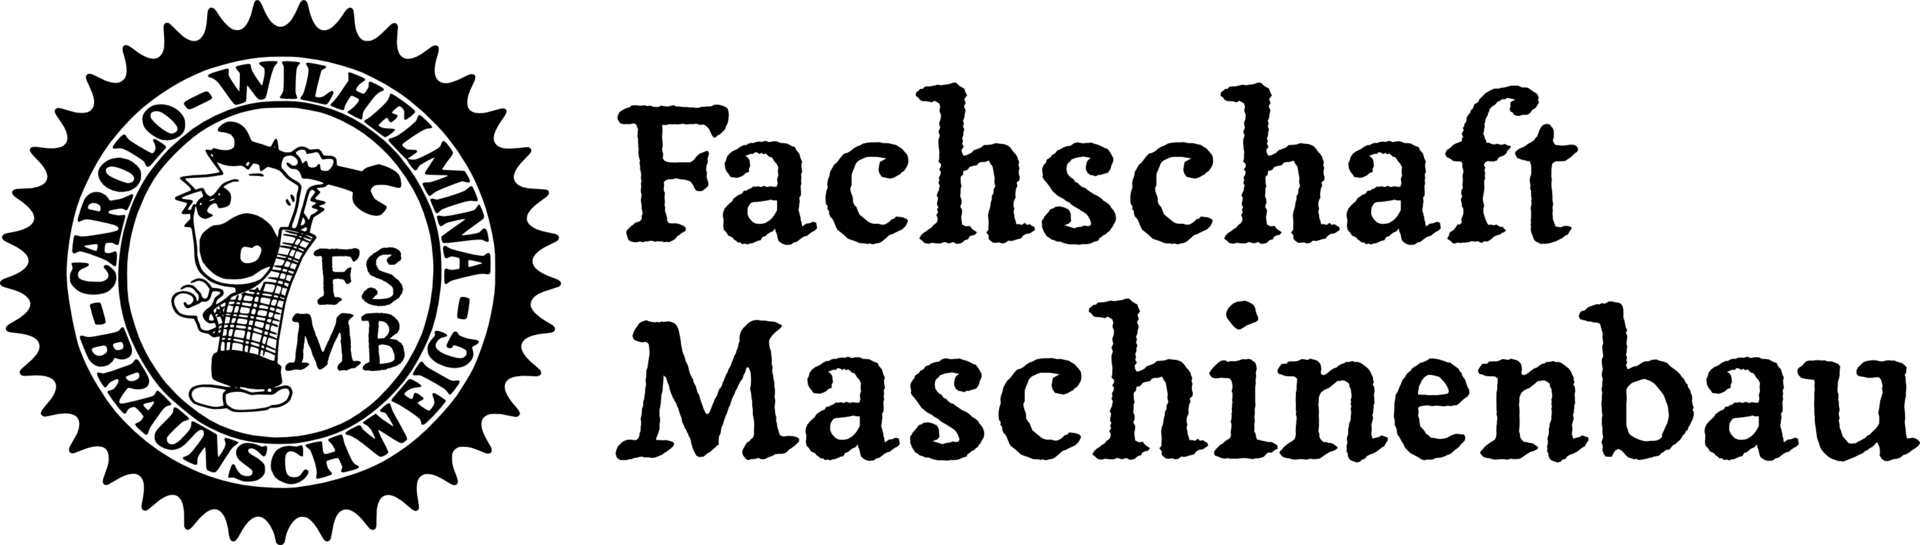 fsmb logo mit schrift daneben